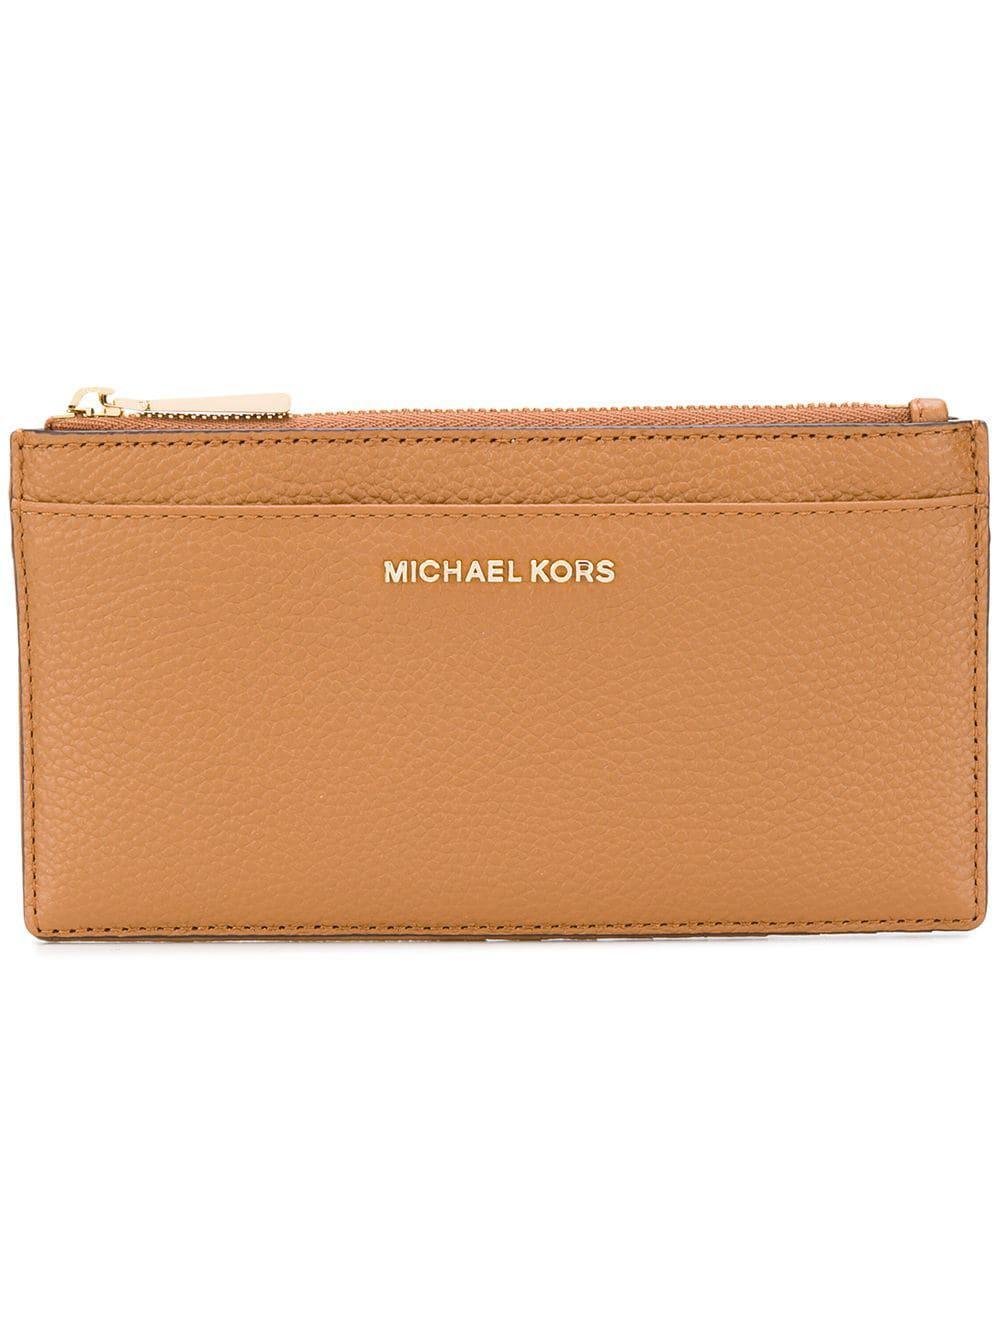 61748e3b7f88 Lyst - MICHAEL Michael Kors Acorn Wallet in Brown